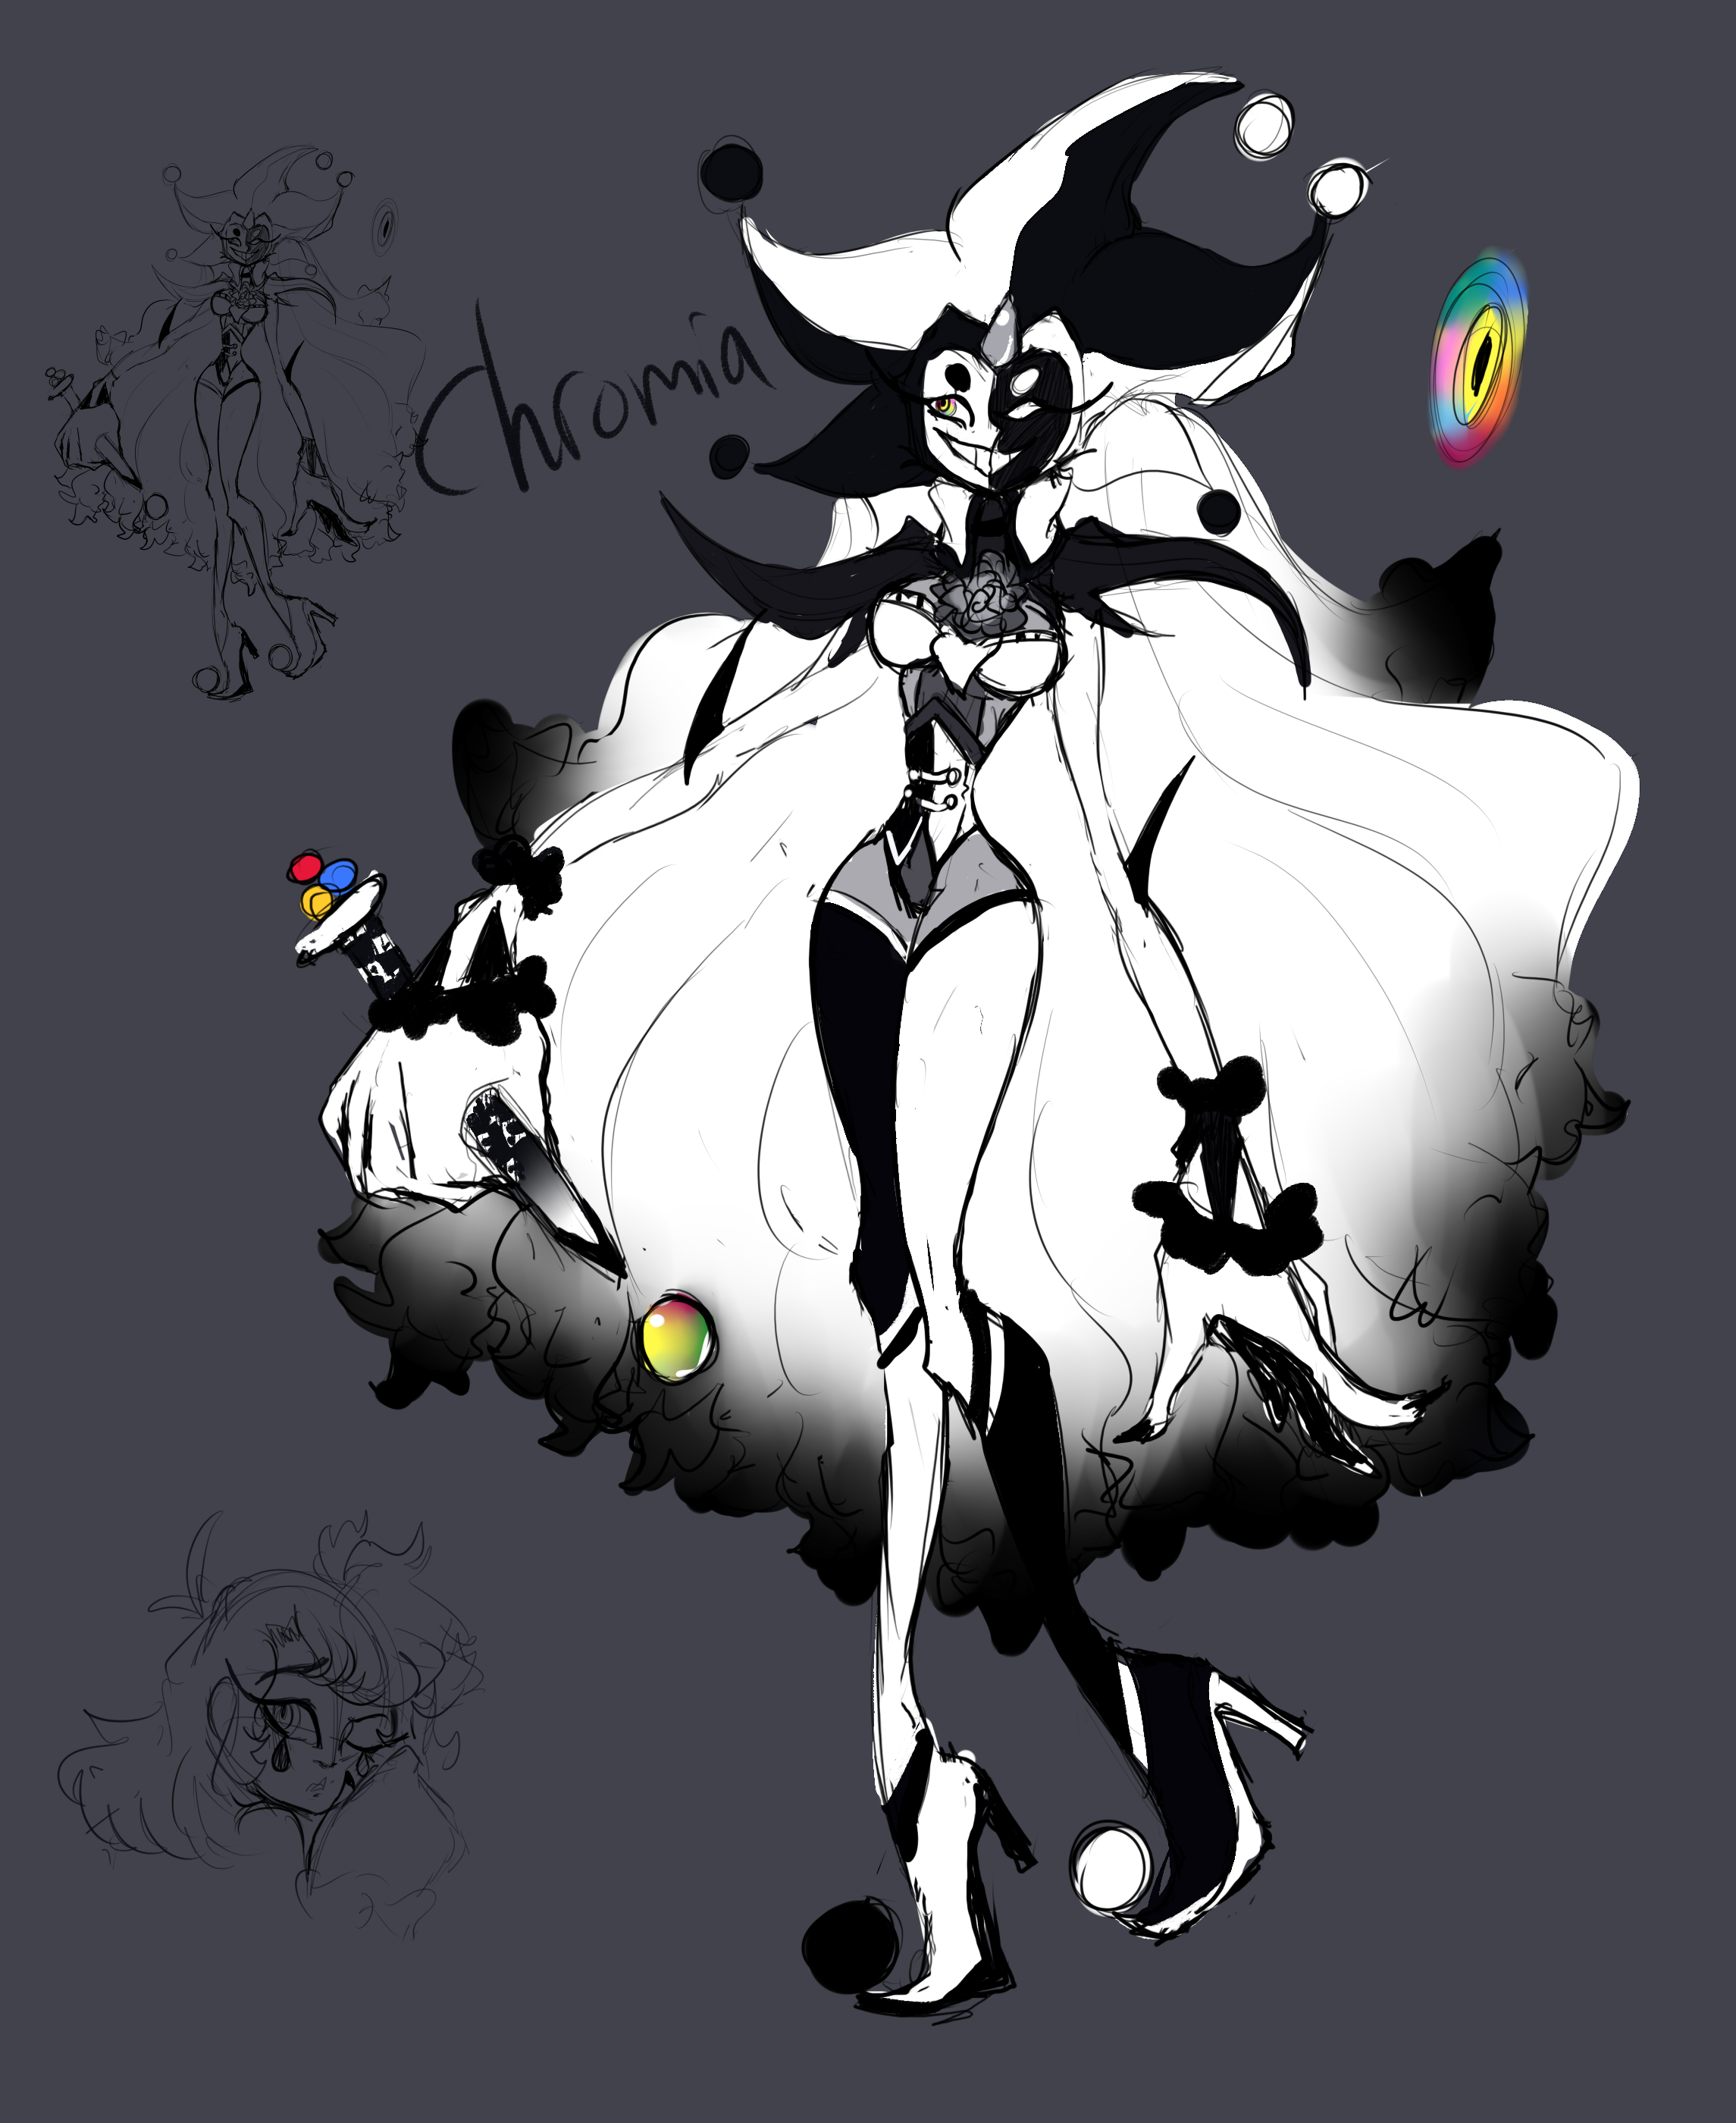 Chromia Reference{Balan Wonderworld Fancharacter}